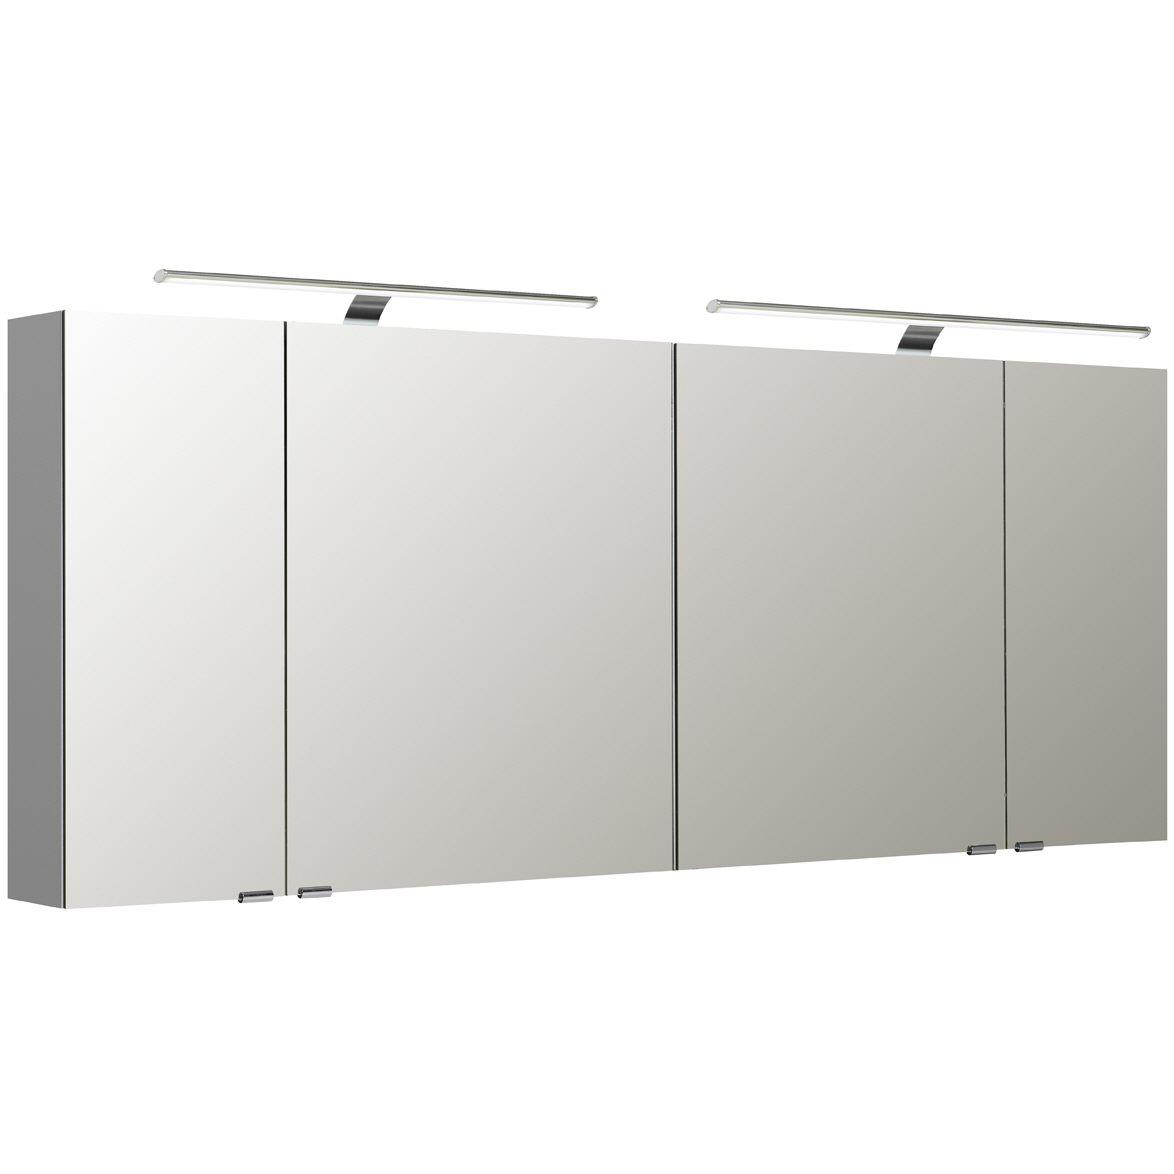 pelipal s5 spiegelschrank 180 x 16 x 70 cm mit 2 led. Black Bedroom Furniture Sets. Home Design Ideas